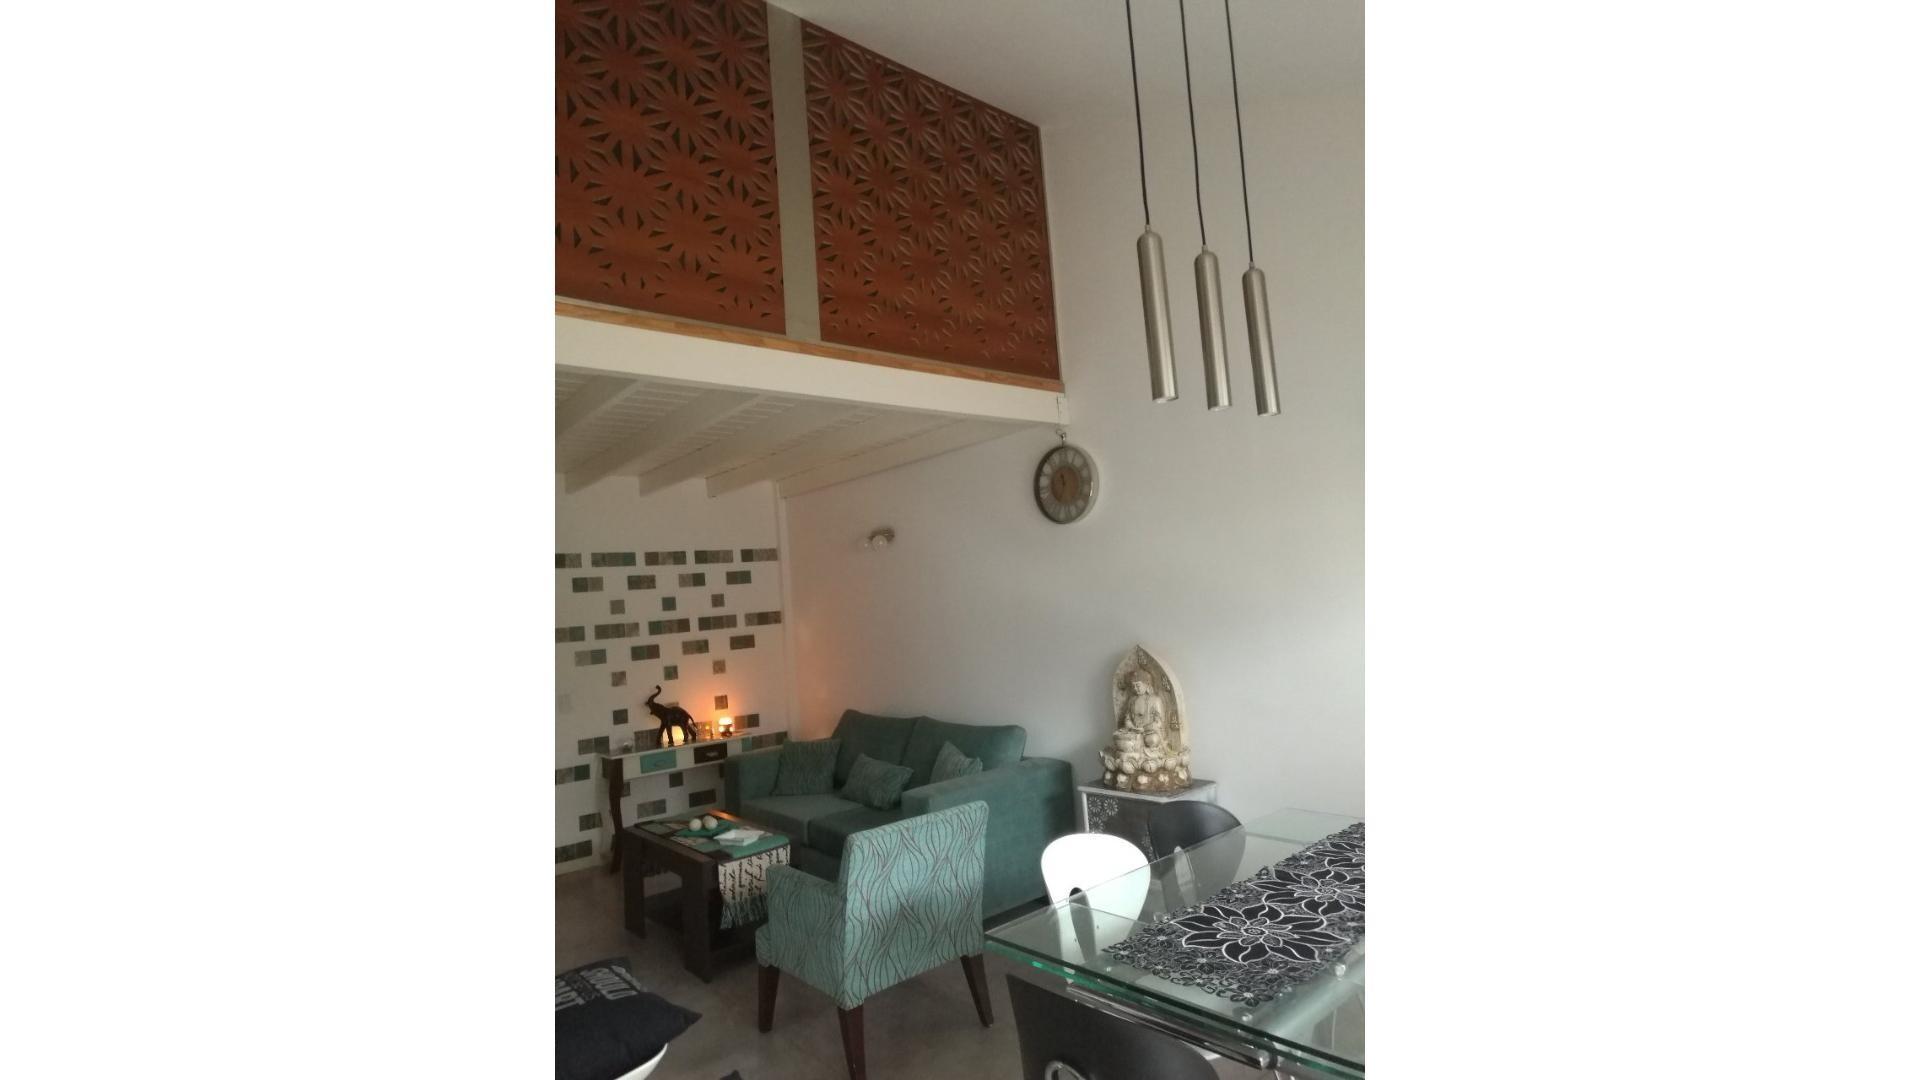 Saenz PeÑa 900, Piso 4 - 3 ambientes con cochera